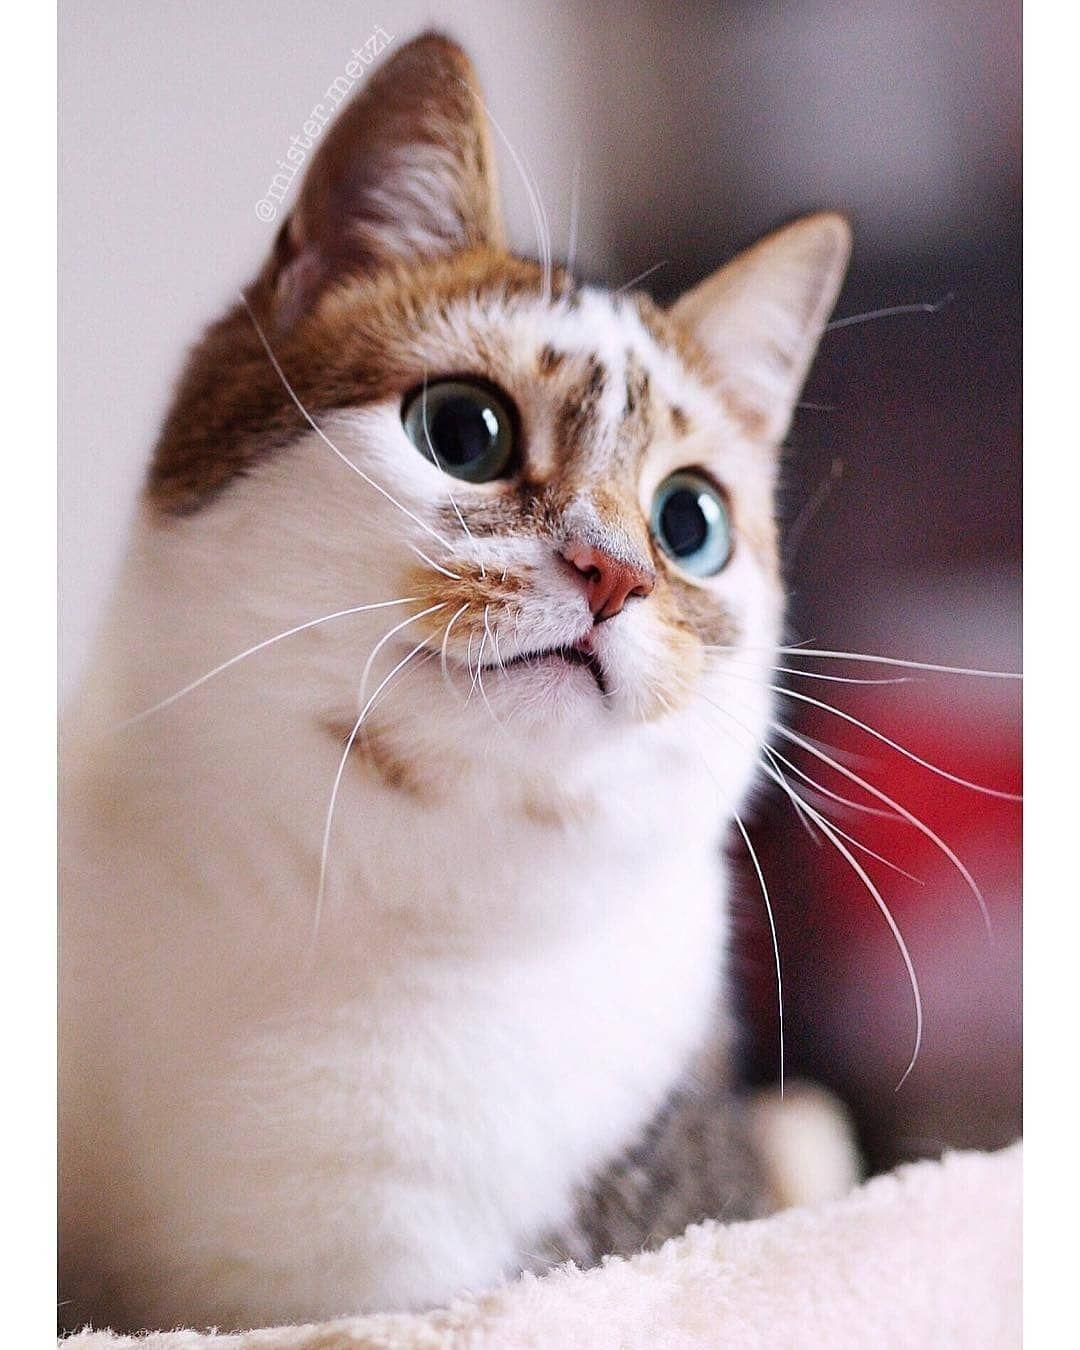 Cute Cats Wallpaper Cute Cat Wallpaper Cute Cats Cats